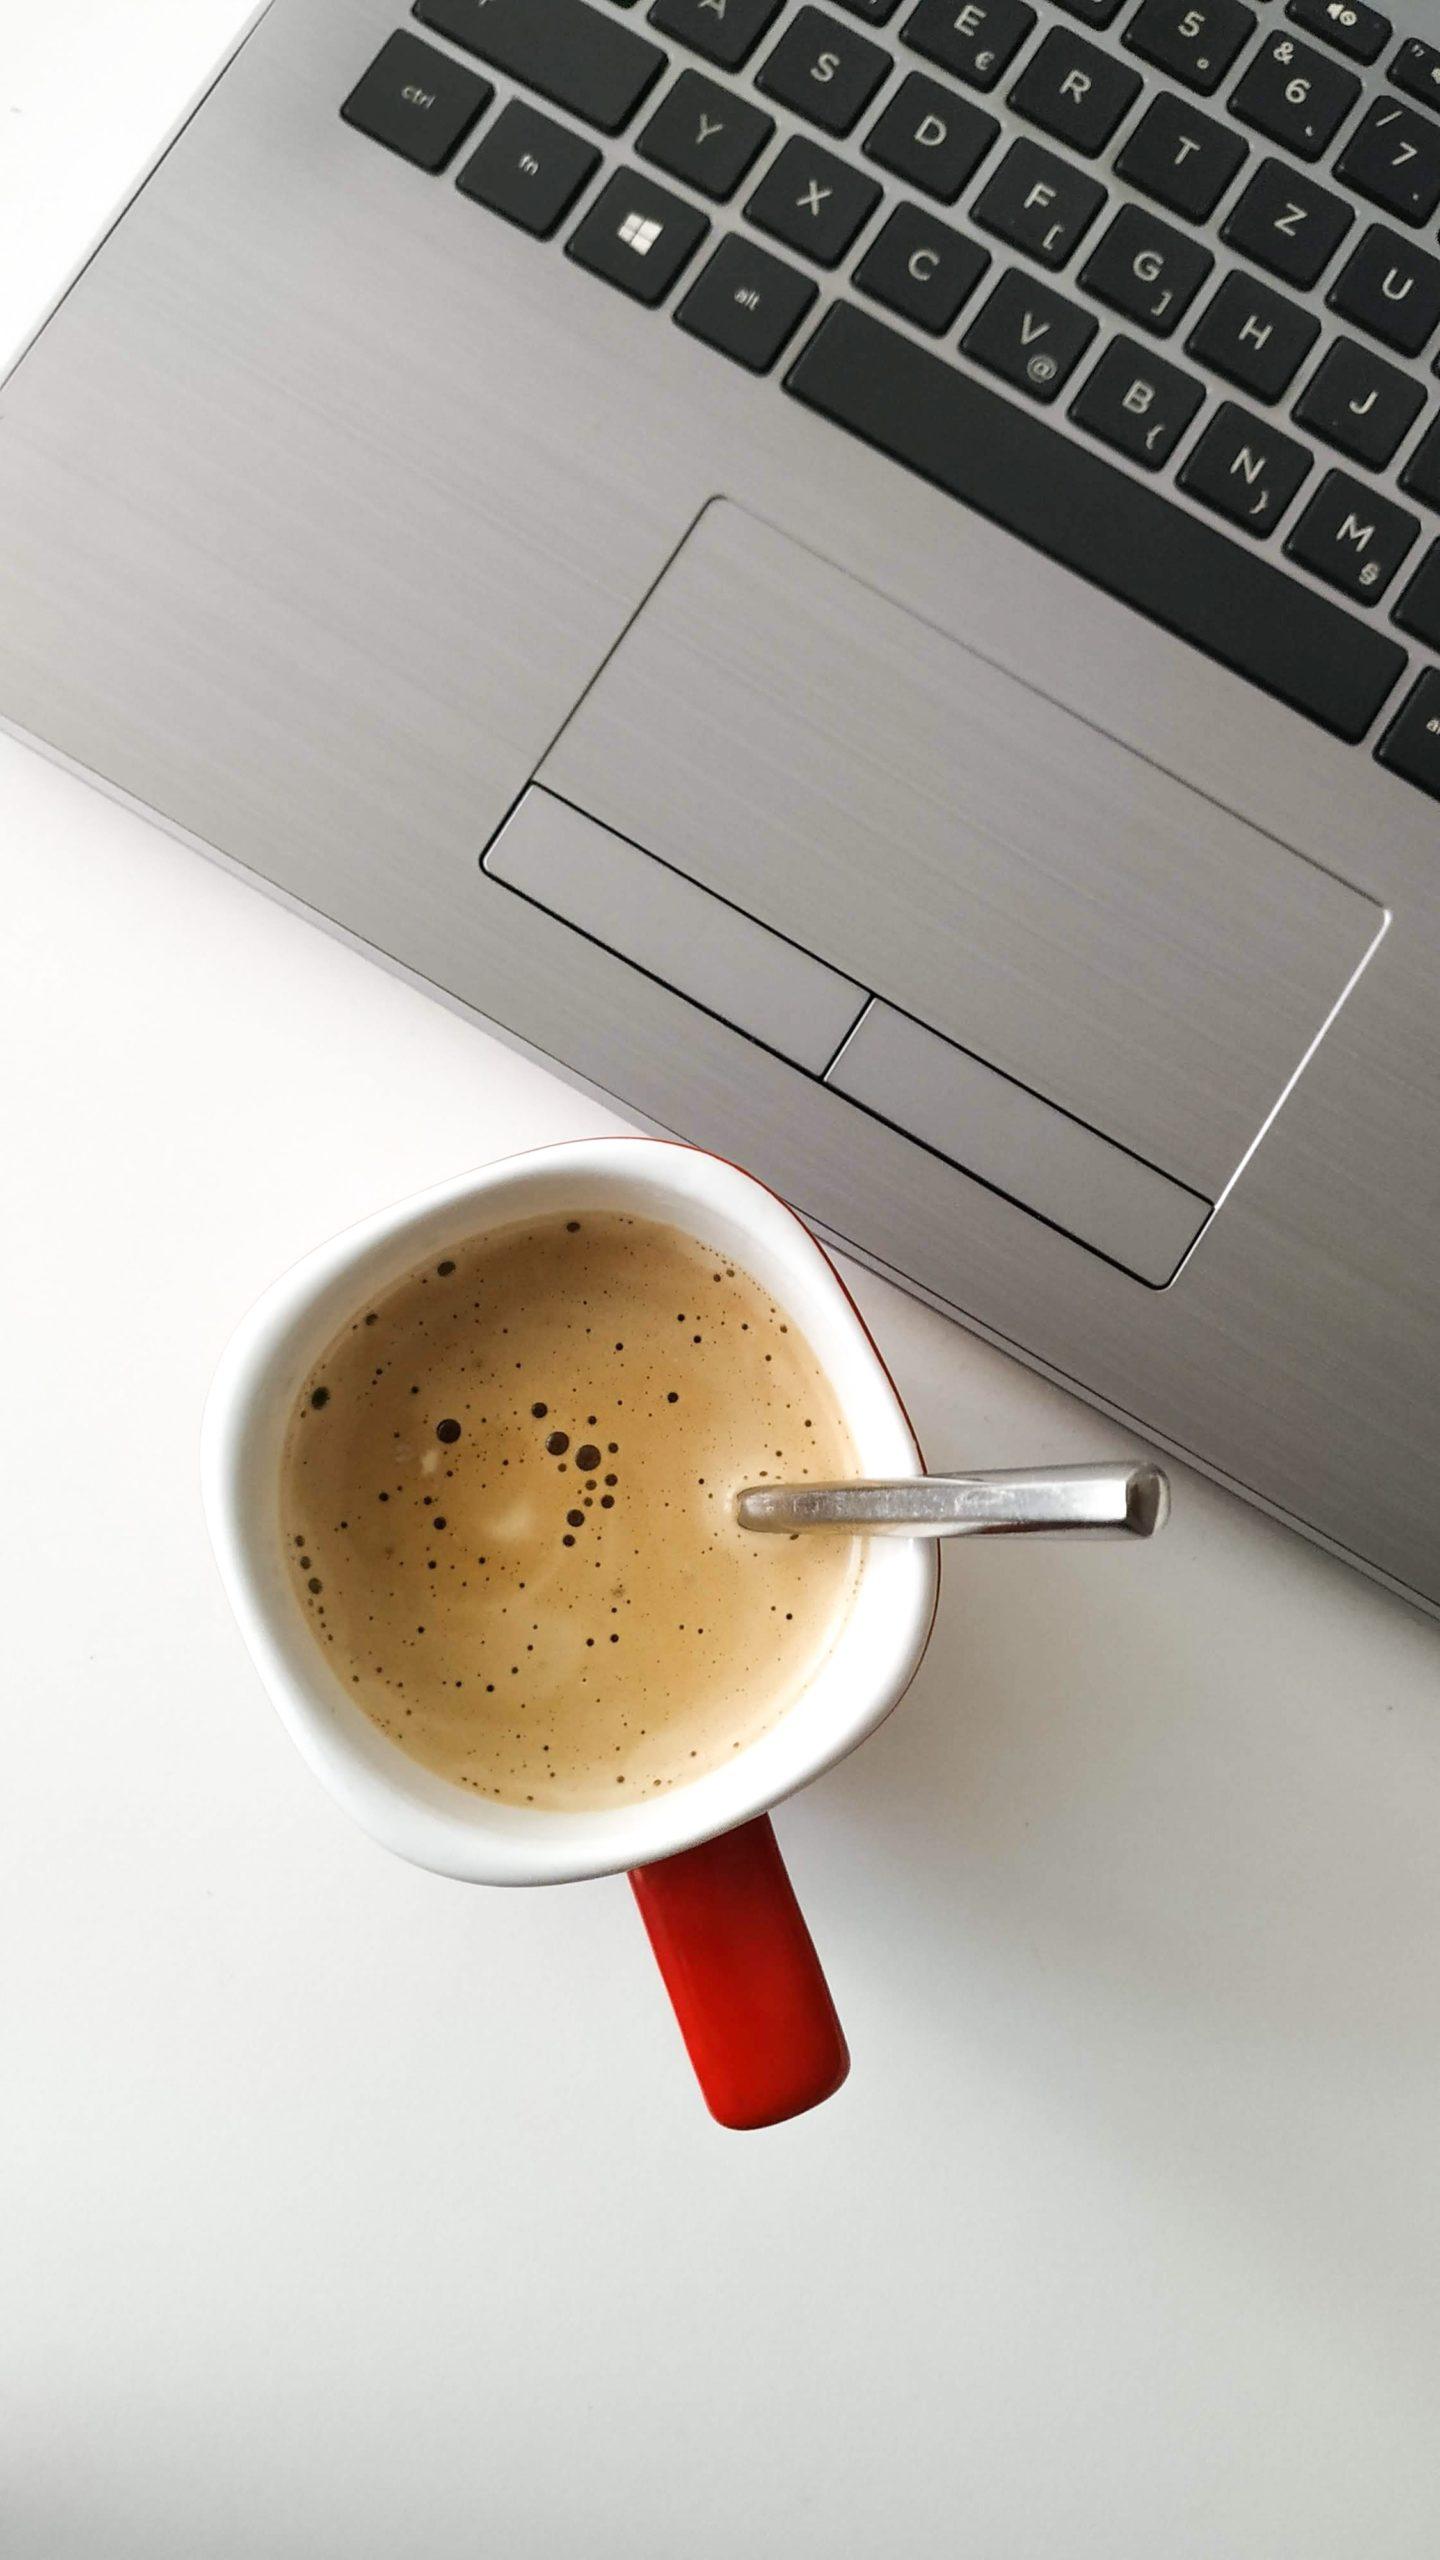 notebook coffee kaffee david-boca-wh7ruevEmrY-unsplash